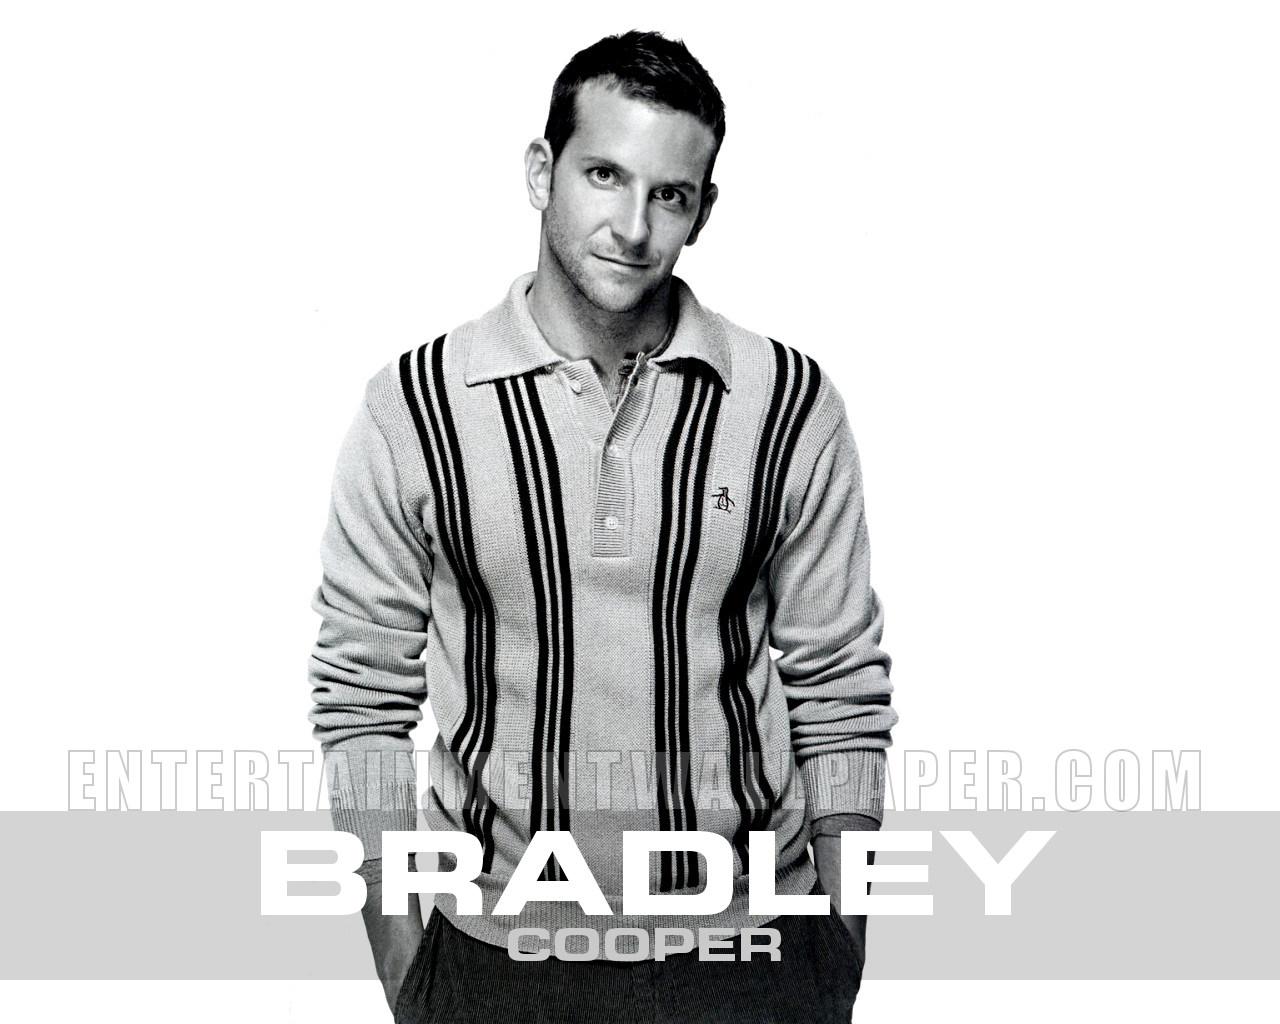 bradley cooper   Bradley Cooper Wallpaper 23904514 1280x1024